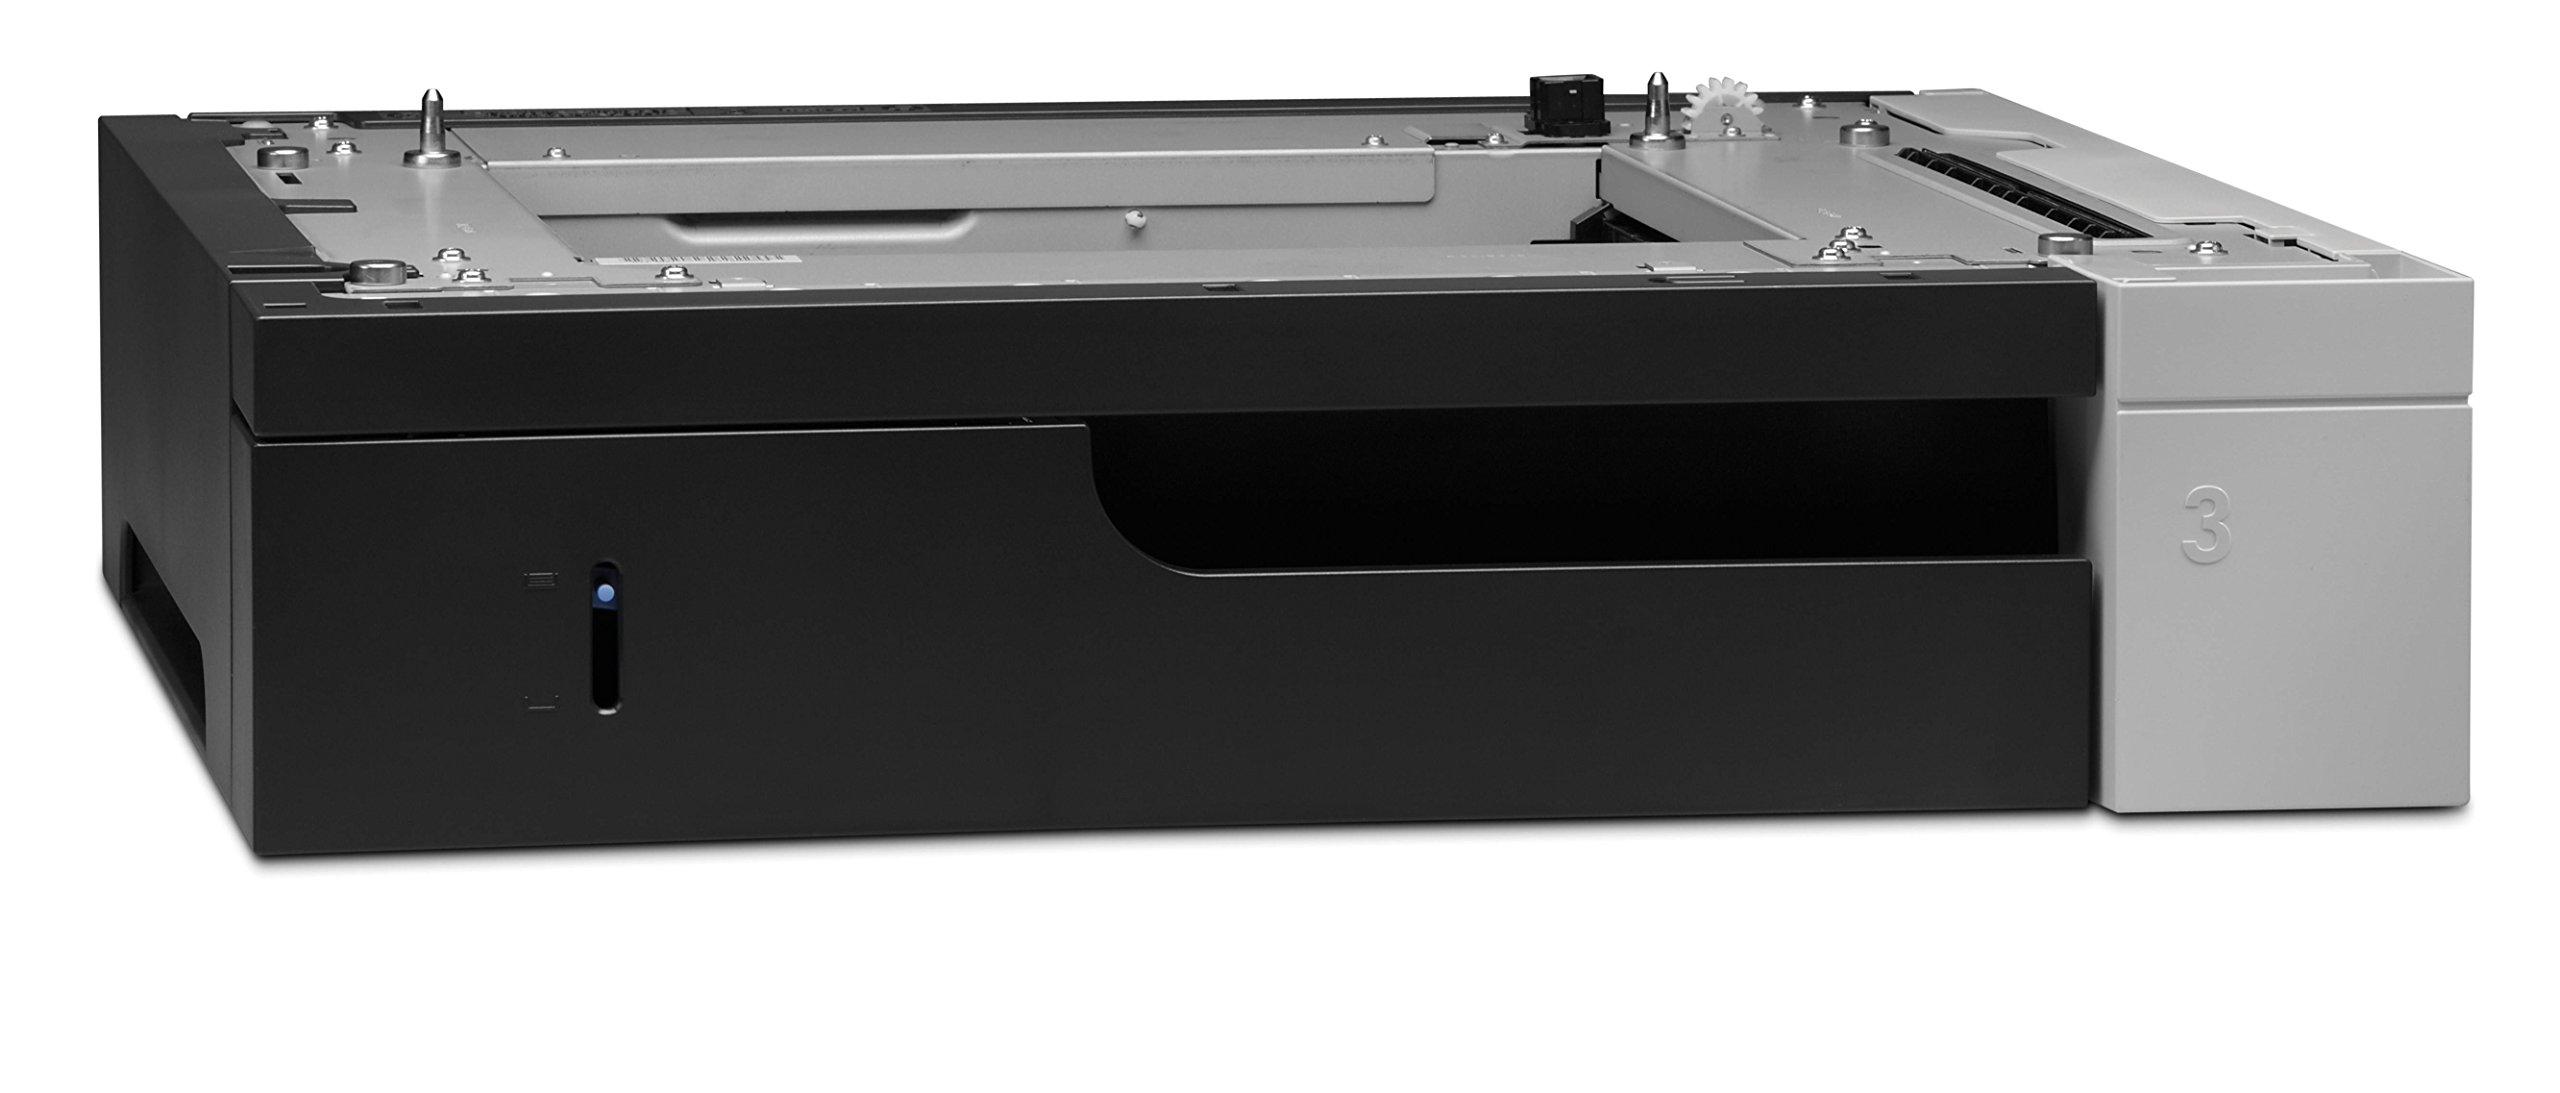 HEWCE737A - HP Paper Feeder for LaserJet M4555 MFP Series